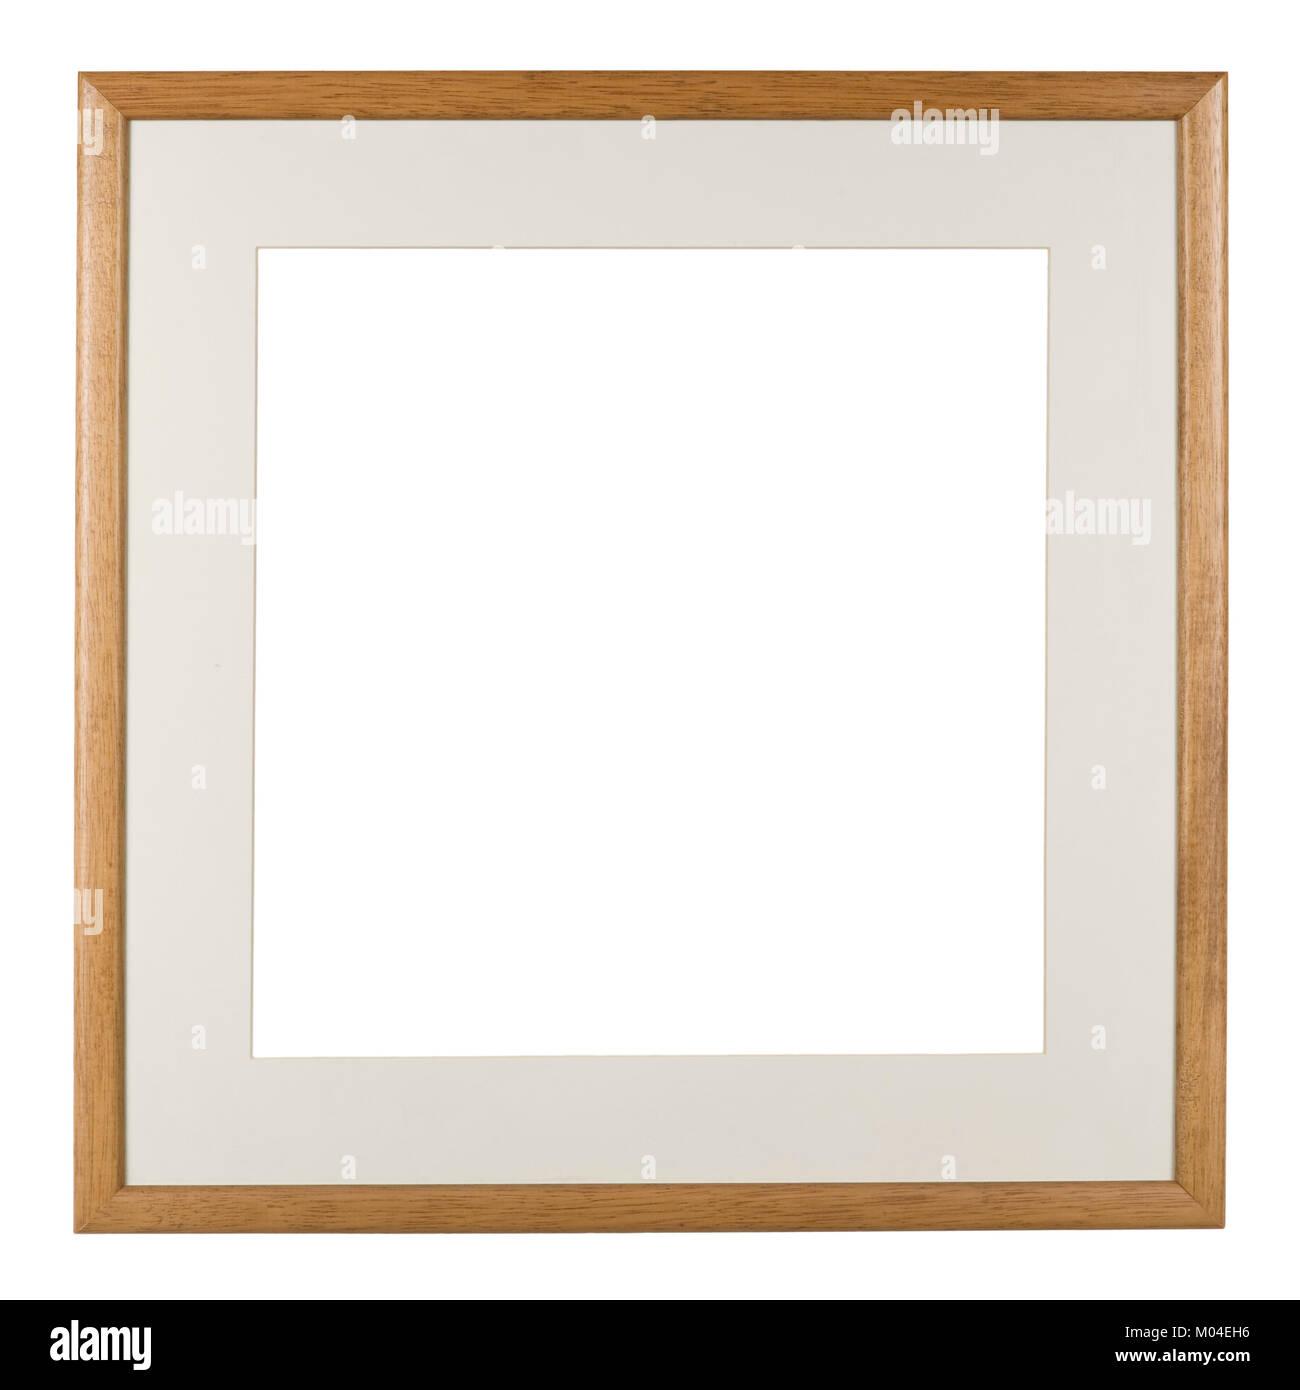 slip painting Stock Photos & slip painting Stock Images - Alamy